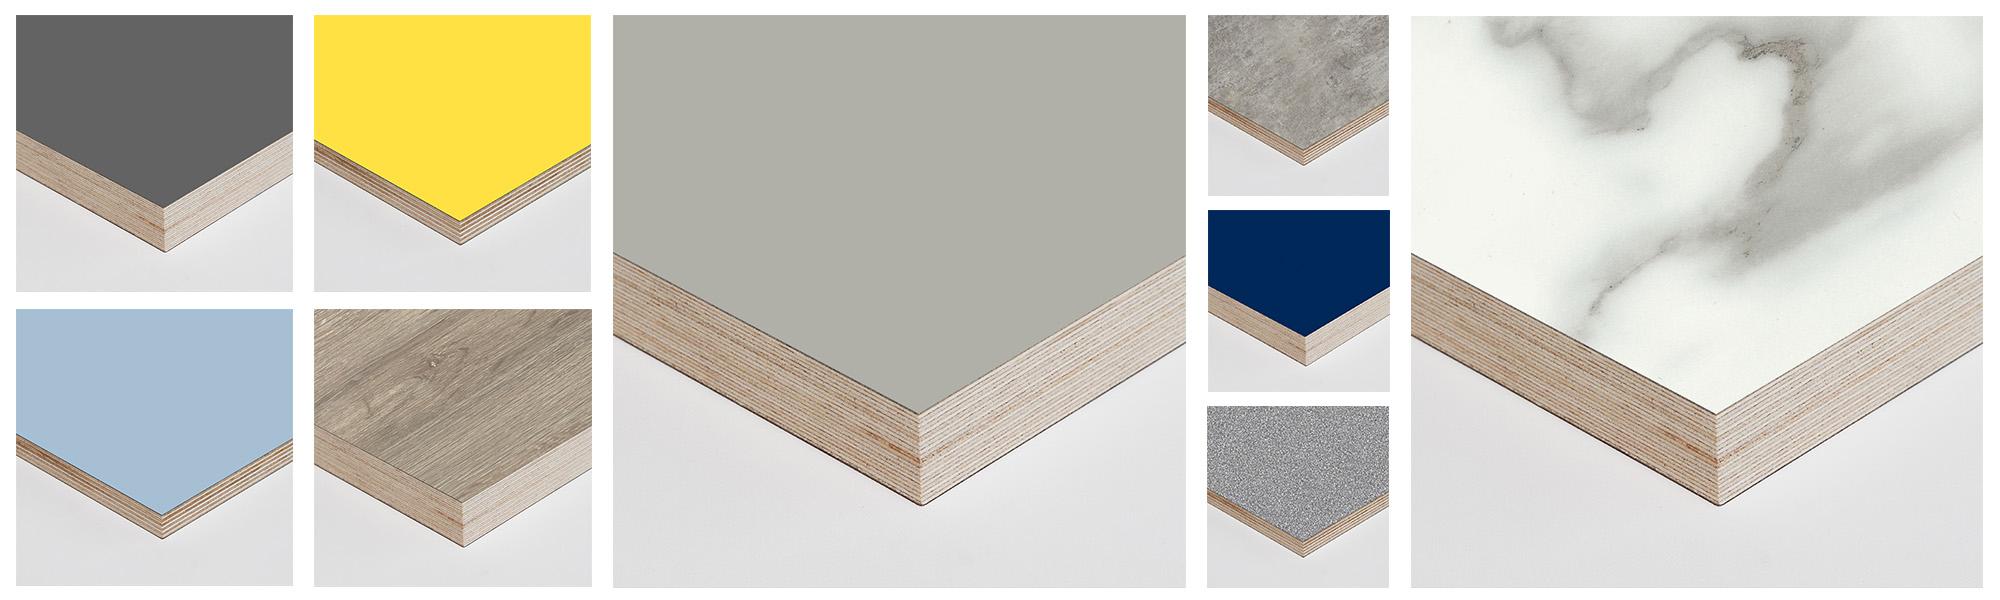 Laminated Birch Plywood Panels